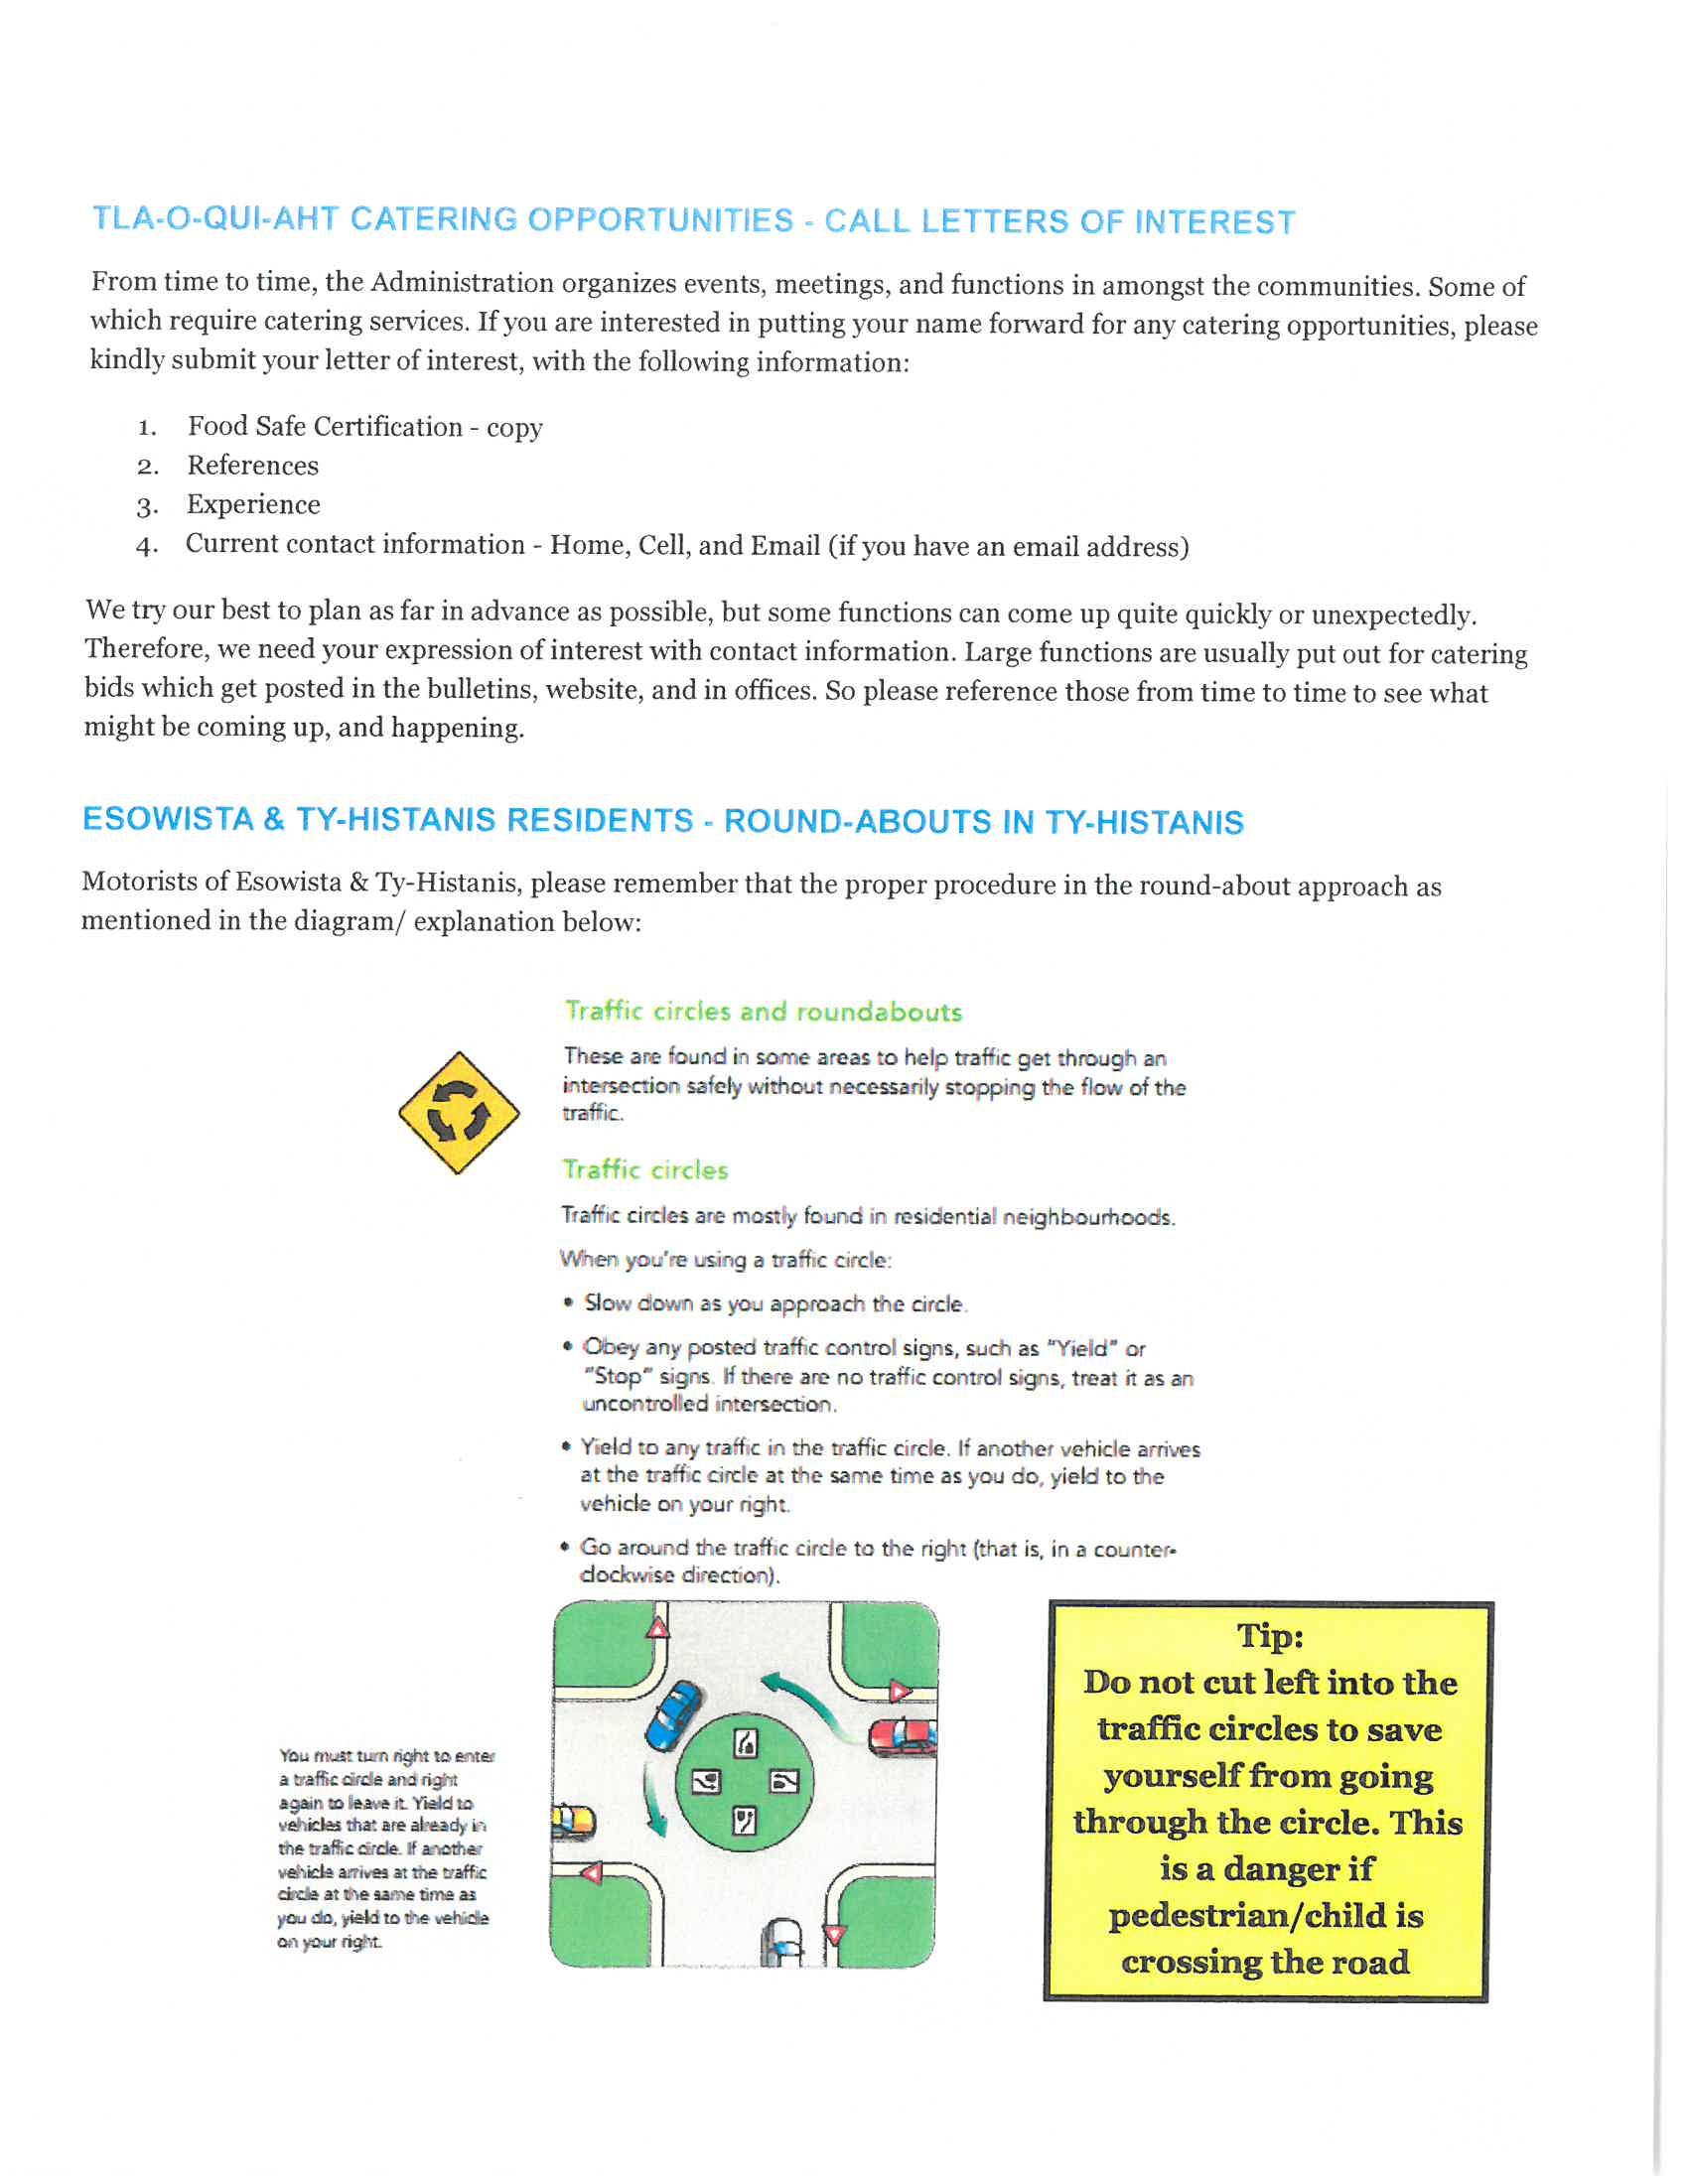 TFN Bulletin Jan 15-2016_Page_05.jpg